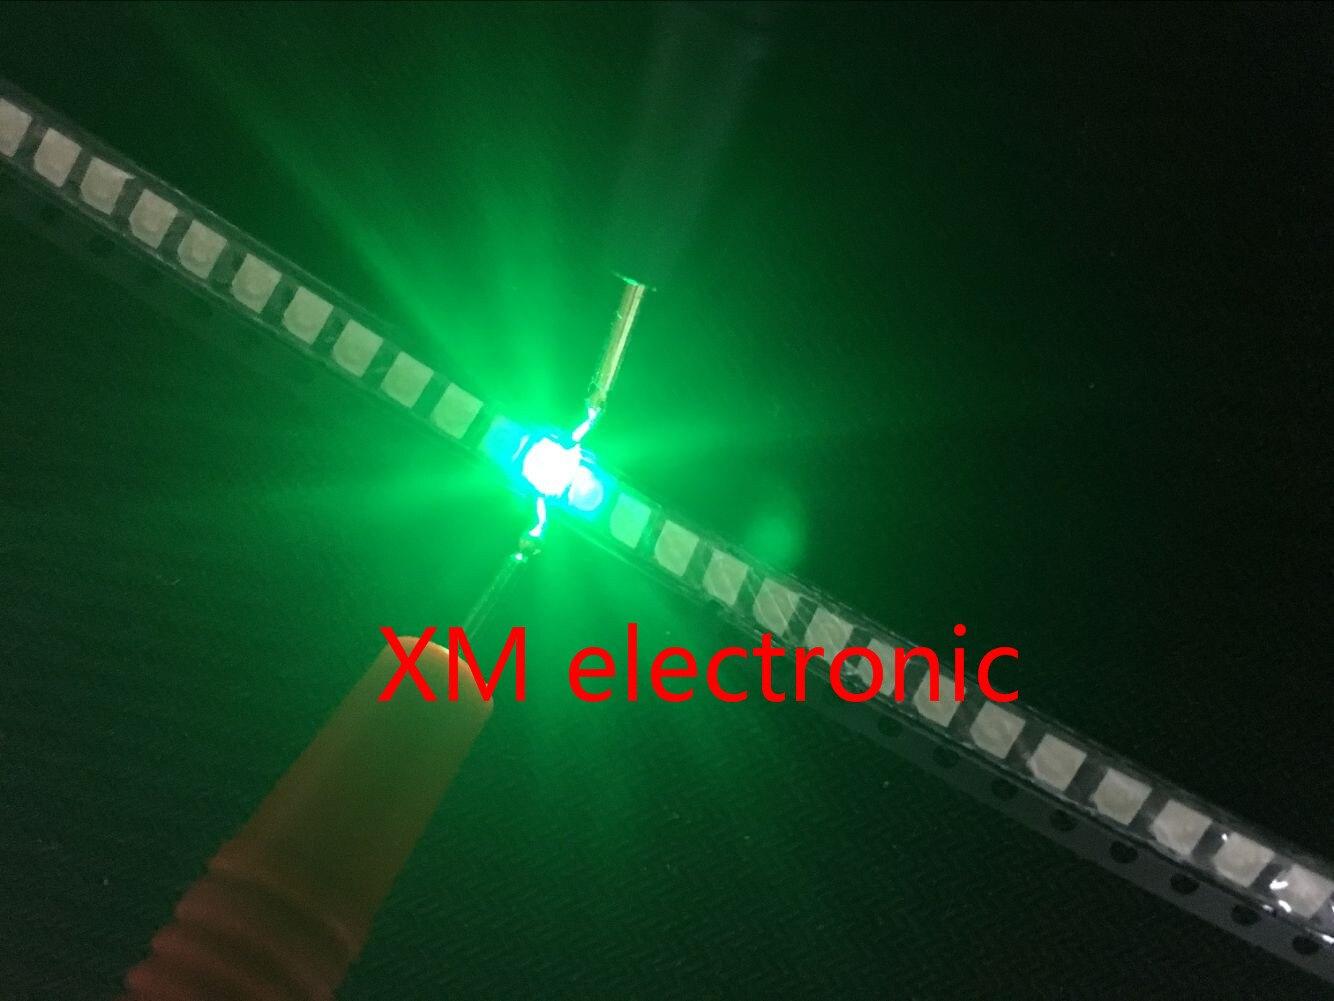 200pcs SMT SMD LED 3528 Green Ultra Bright Light-Emitting Diode LED Diode Chip Lamp